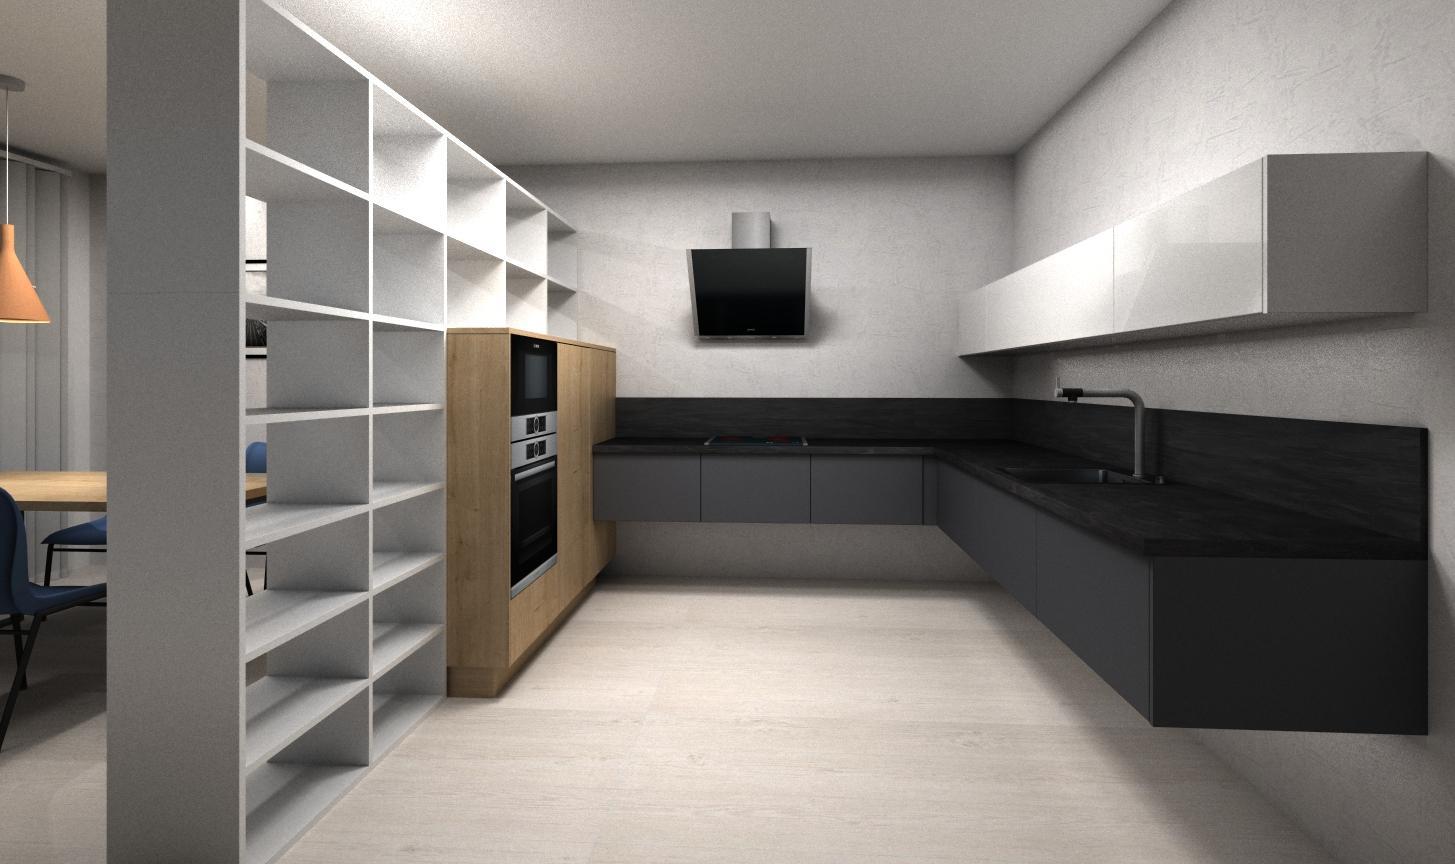 Kuchyne - Obrázok č. 84